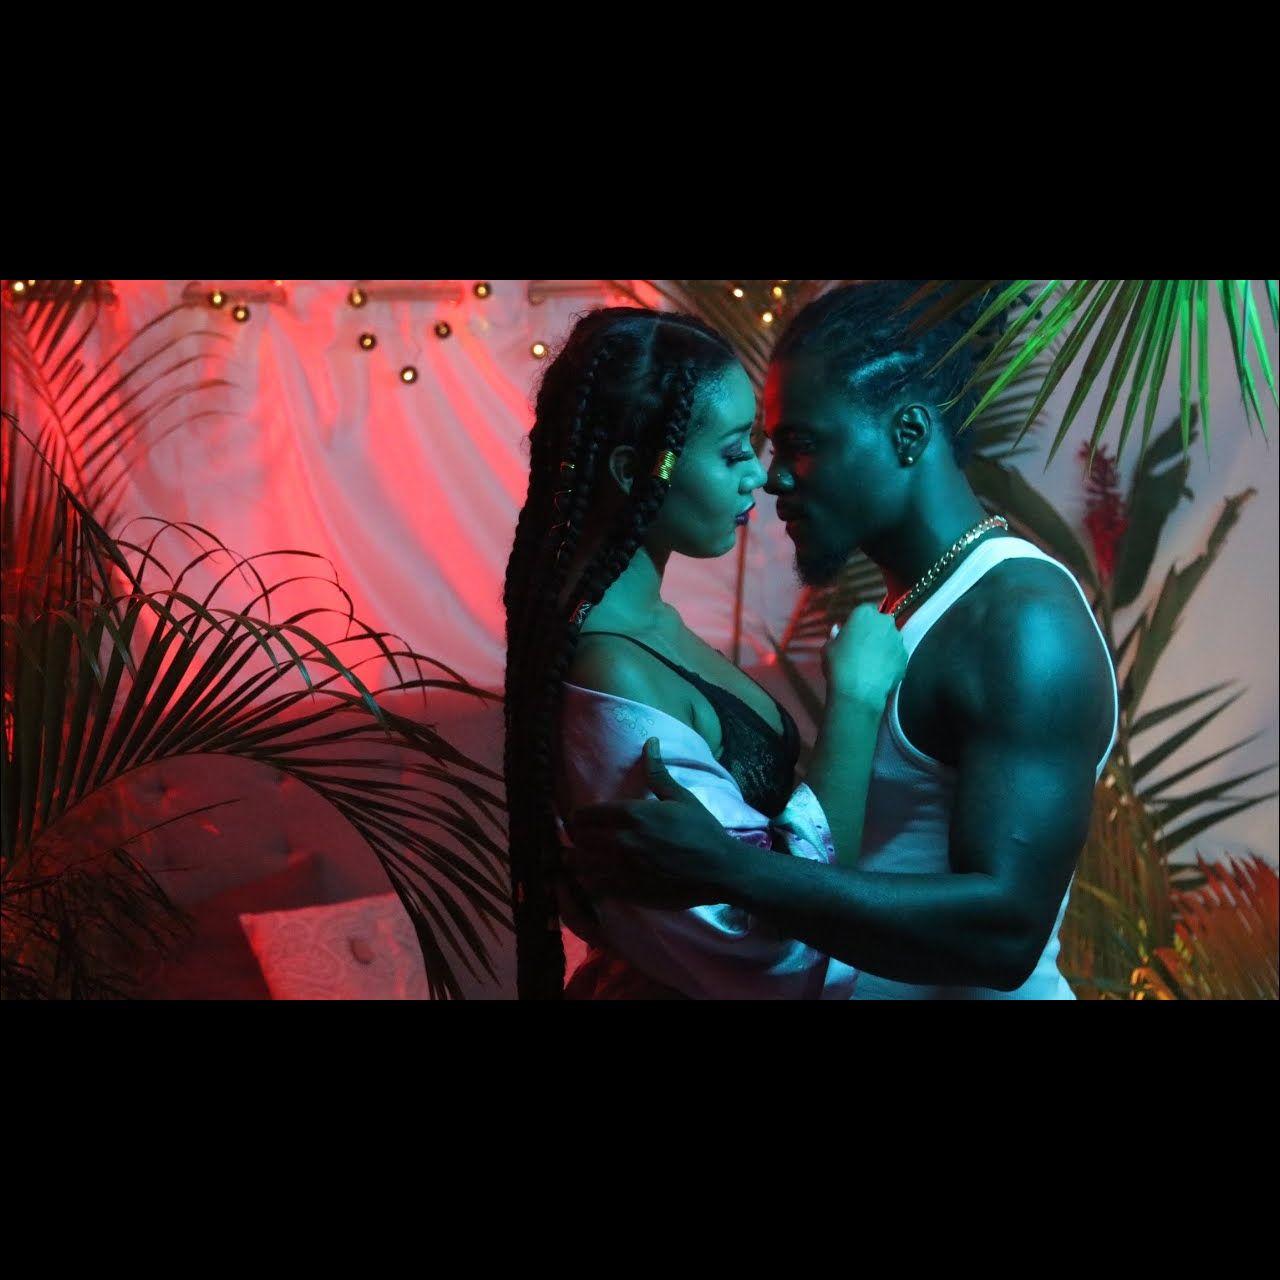 Matieu White - J'aime ton body (Thumbnail)